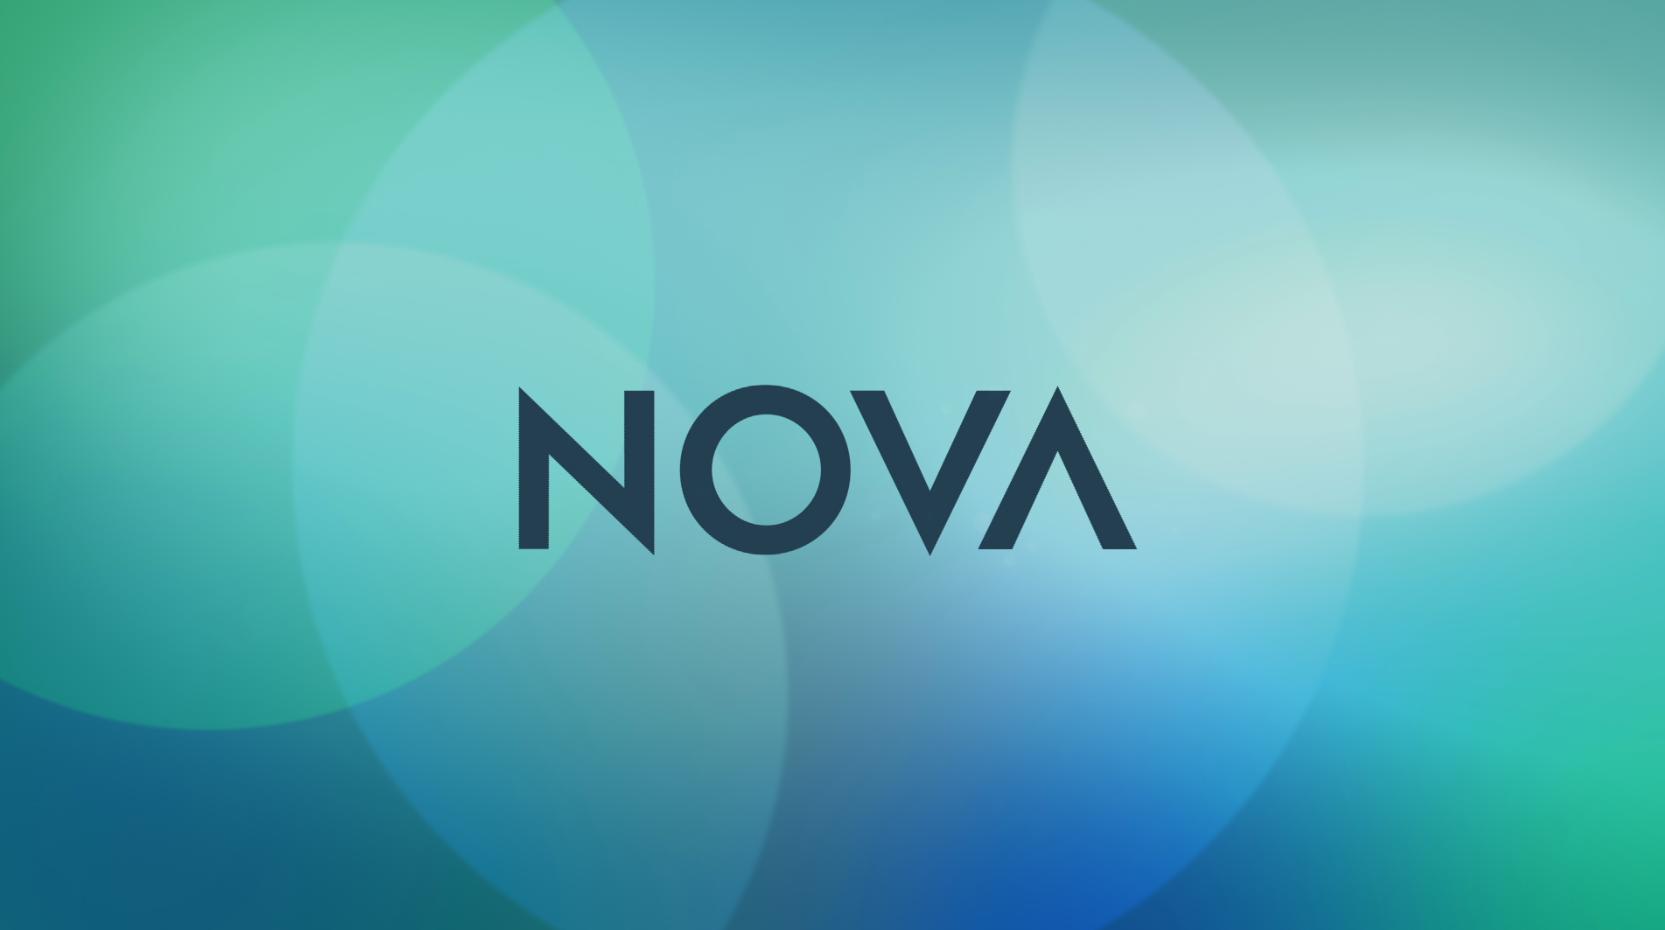 Nova pbs i have no tv for Mynova